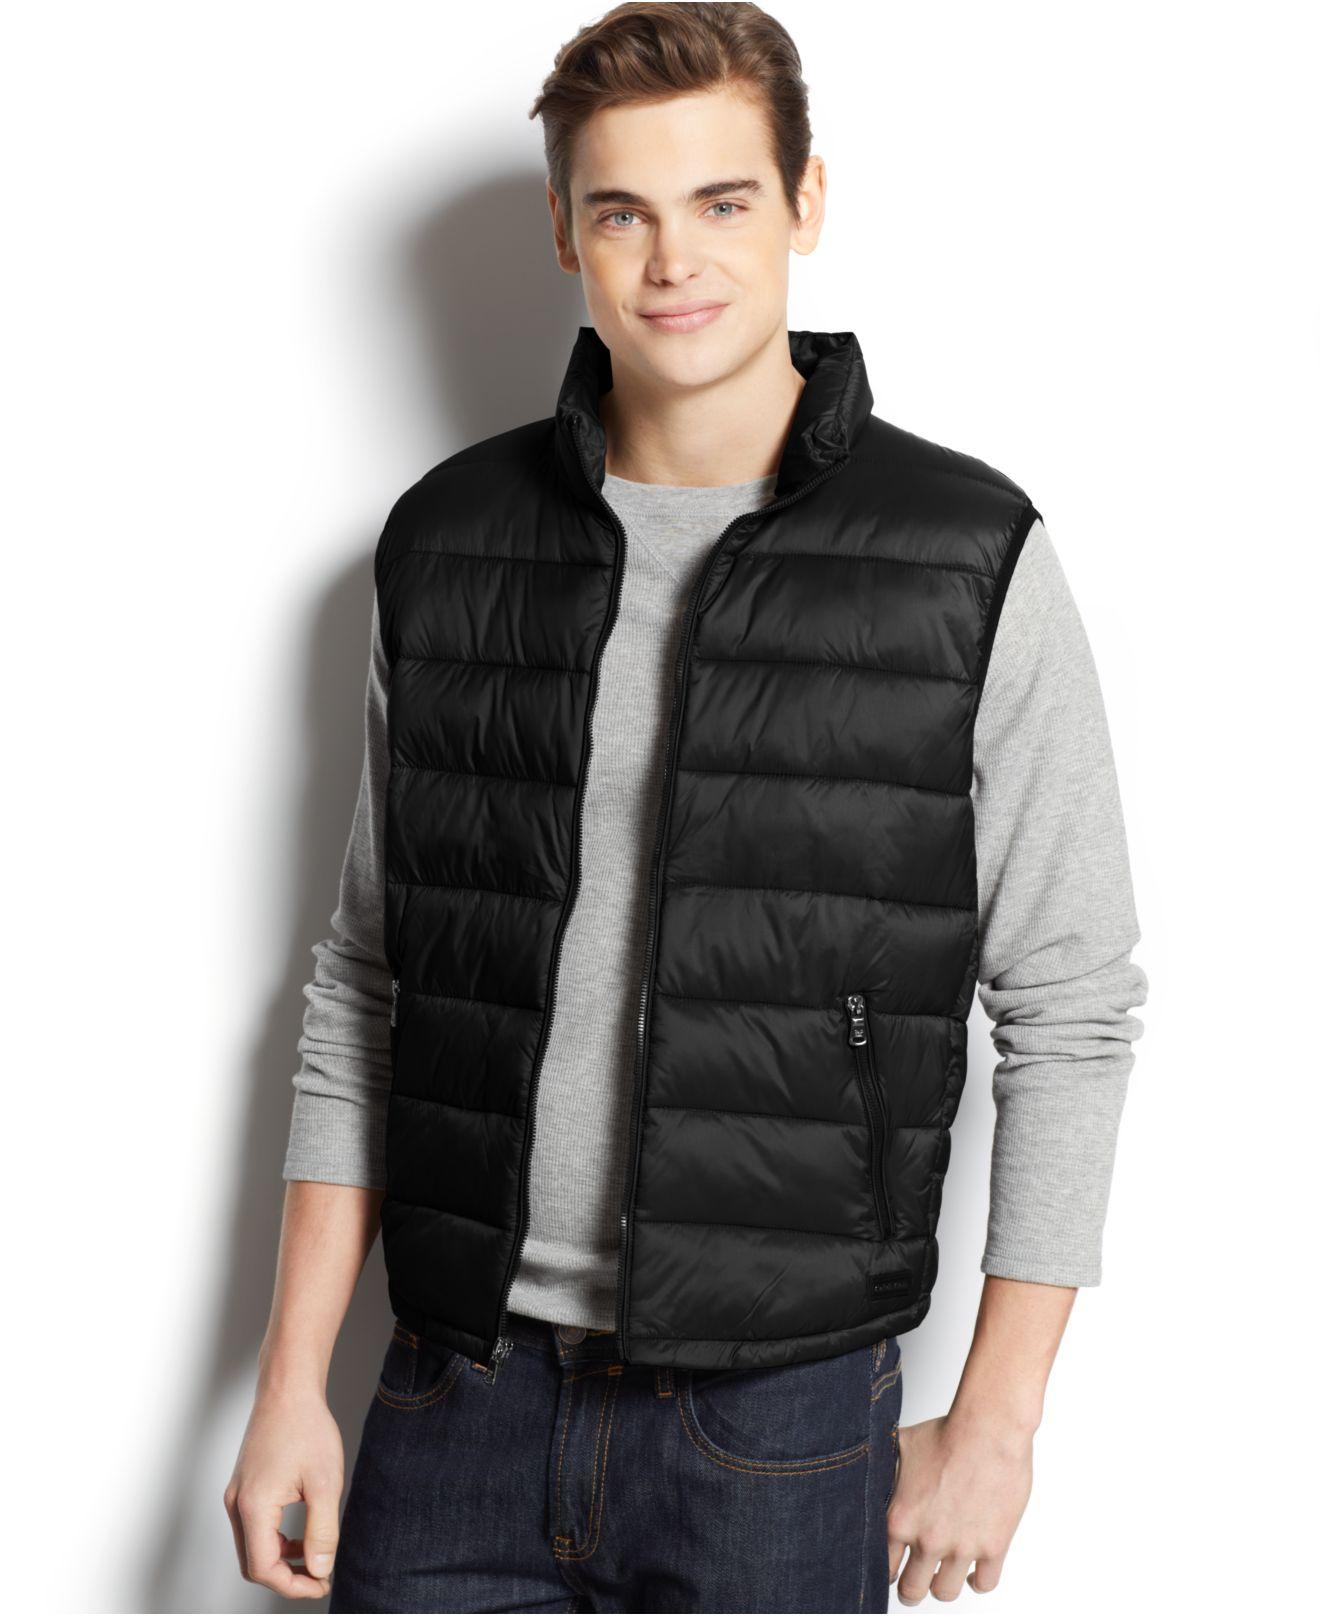 Calvin Klein Packable Puffer Vest In Black For Men Lyst